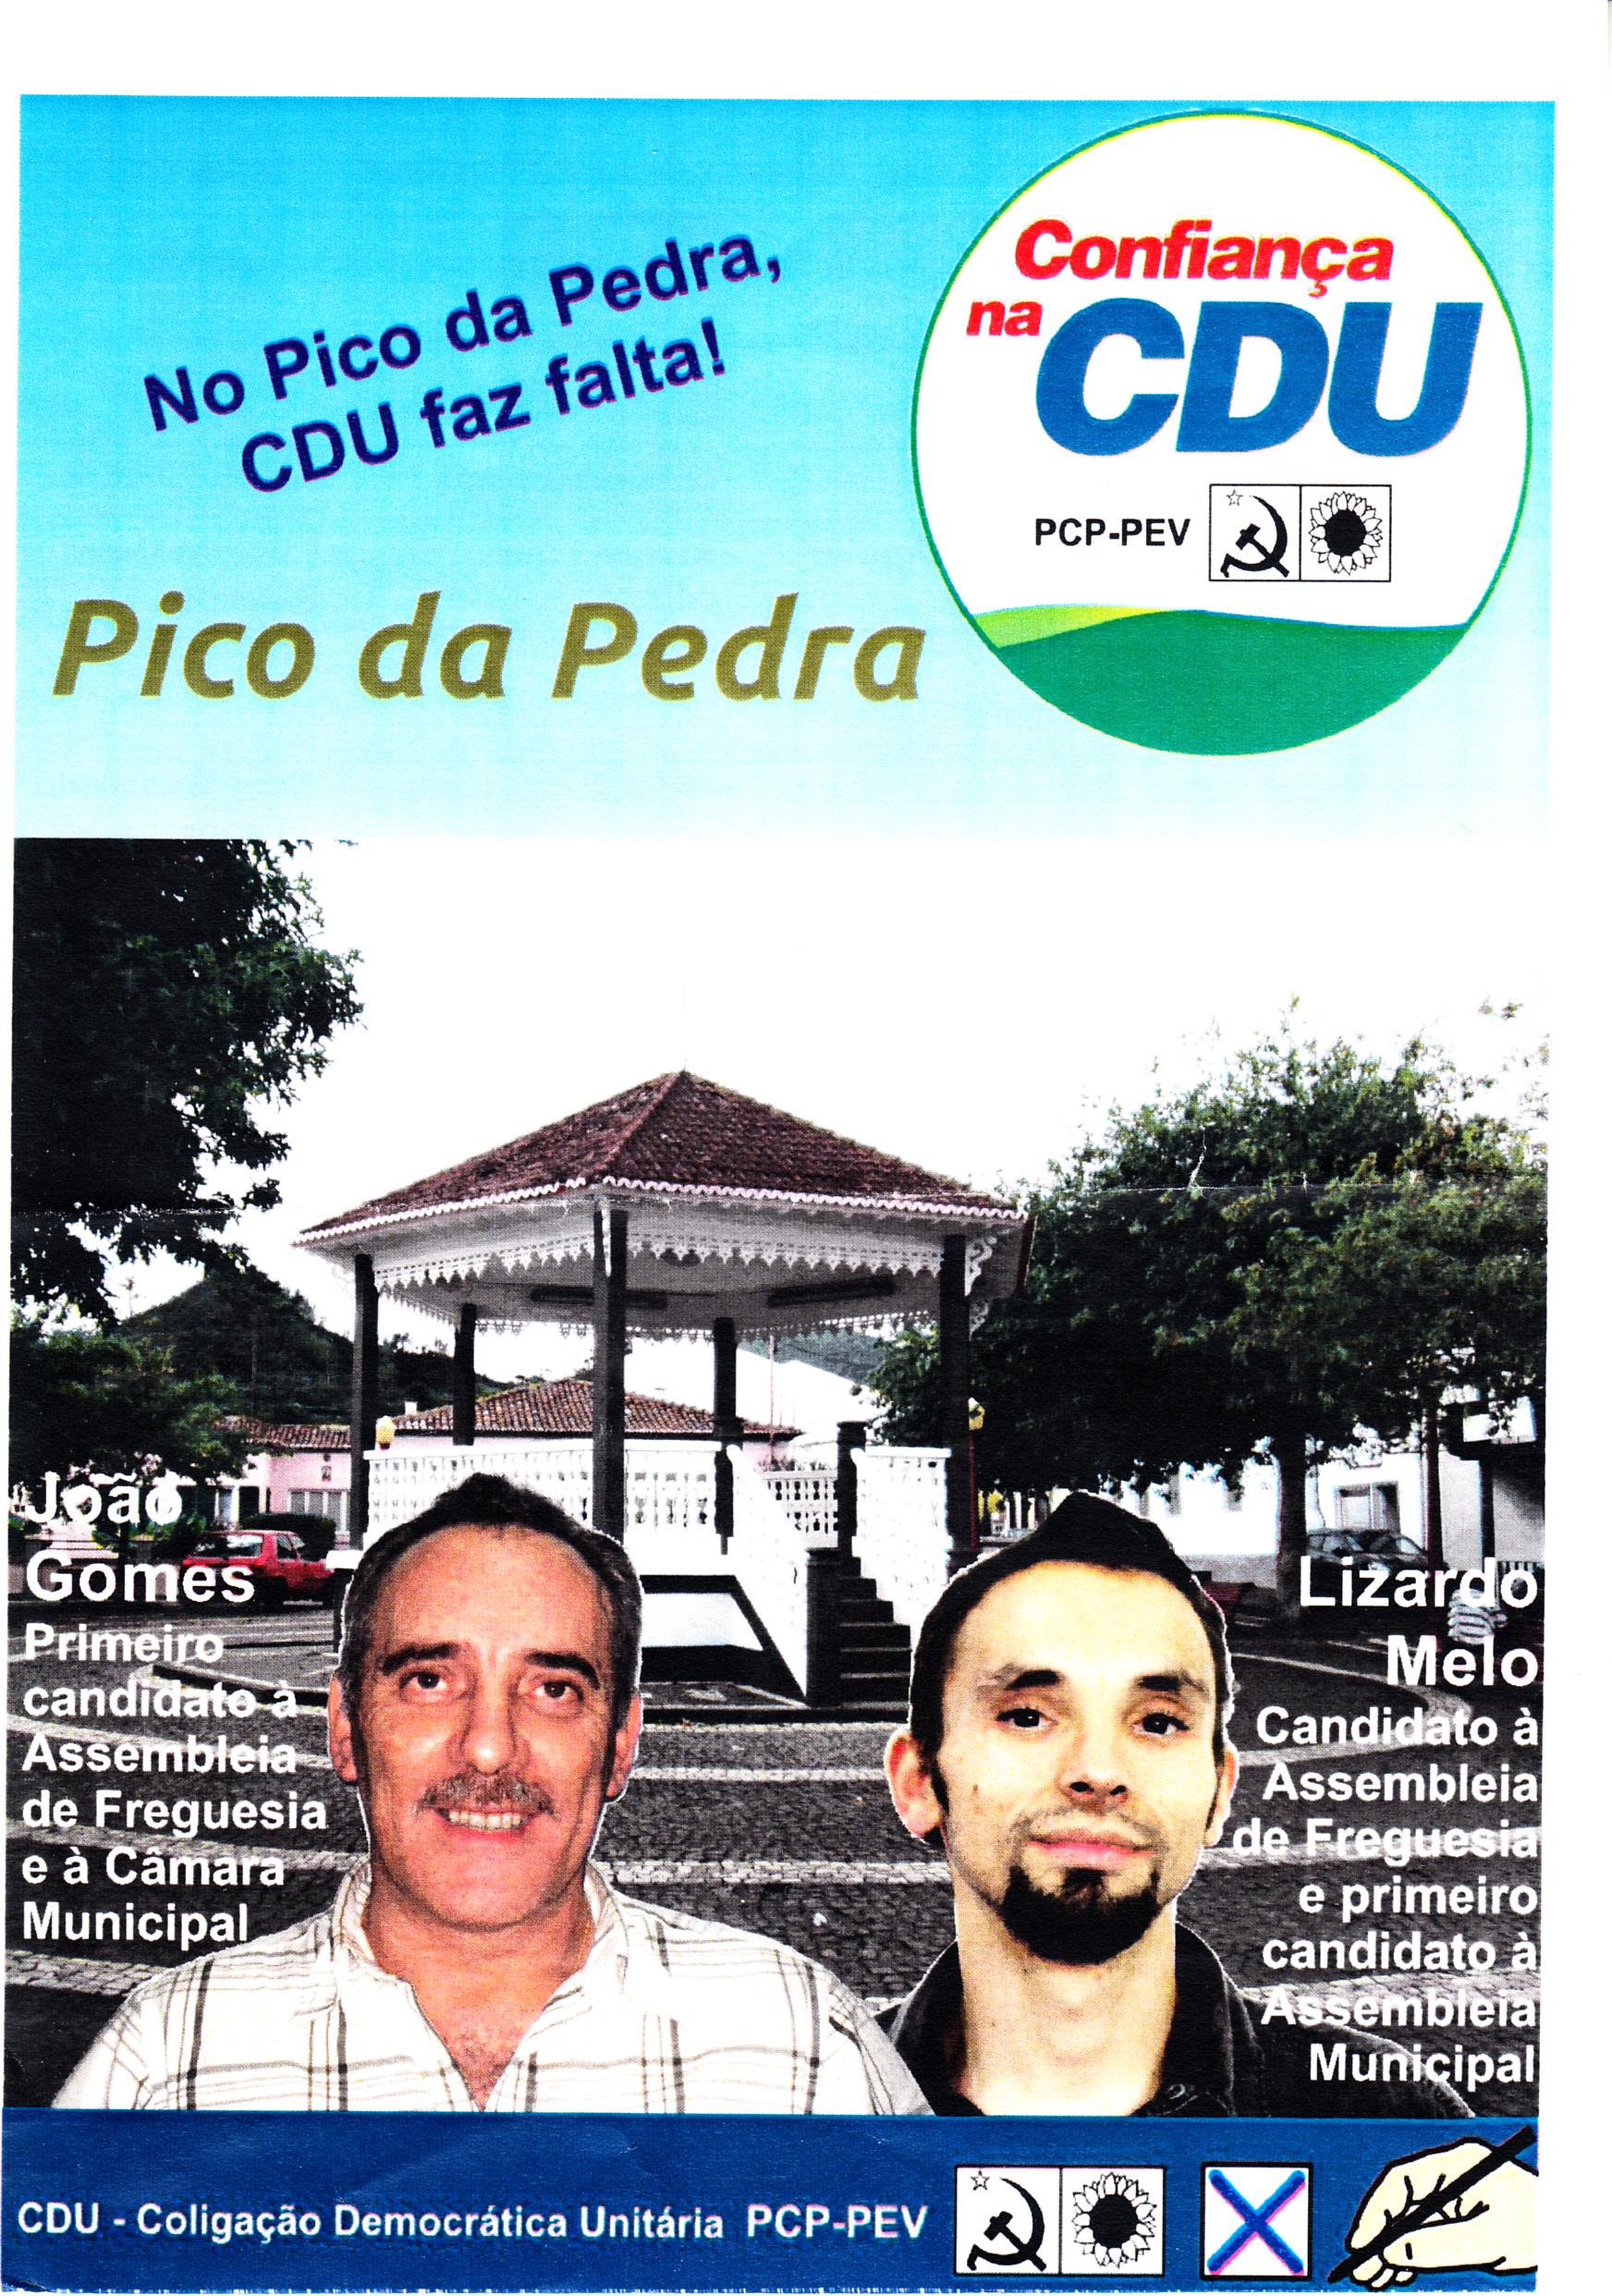 CDU_2013_Pico_Pedra_Acores_0001